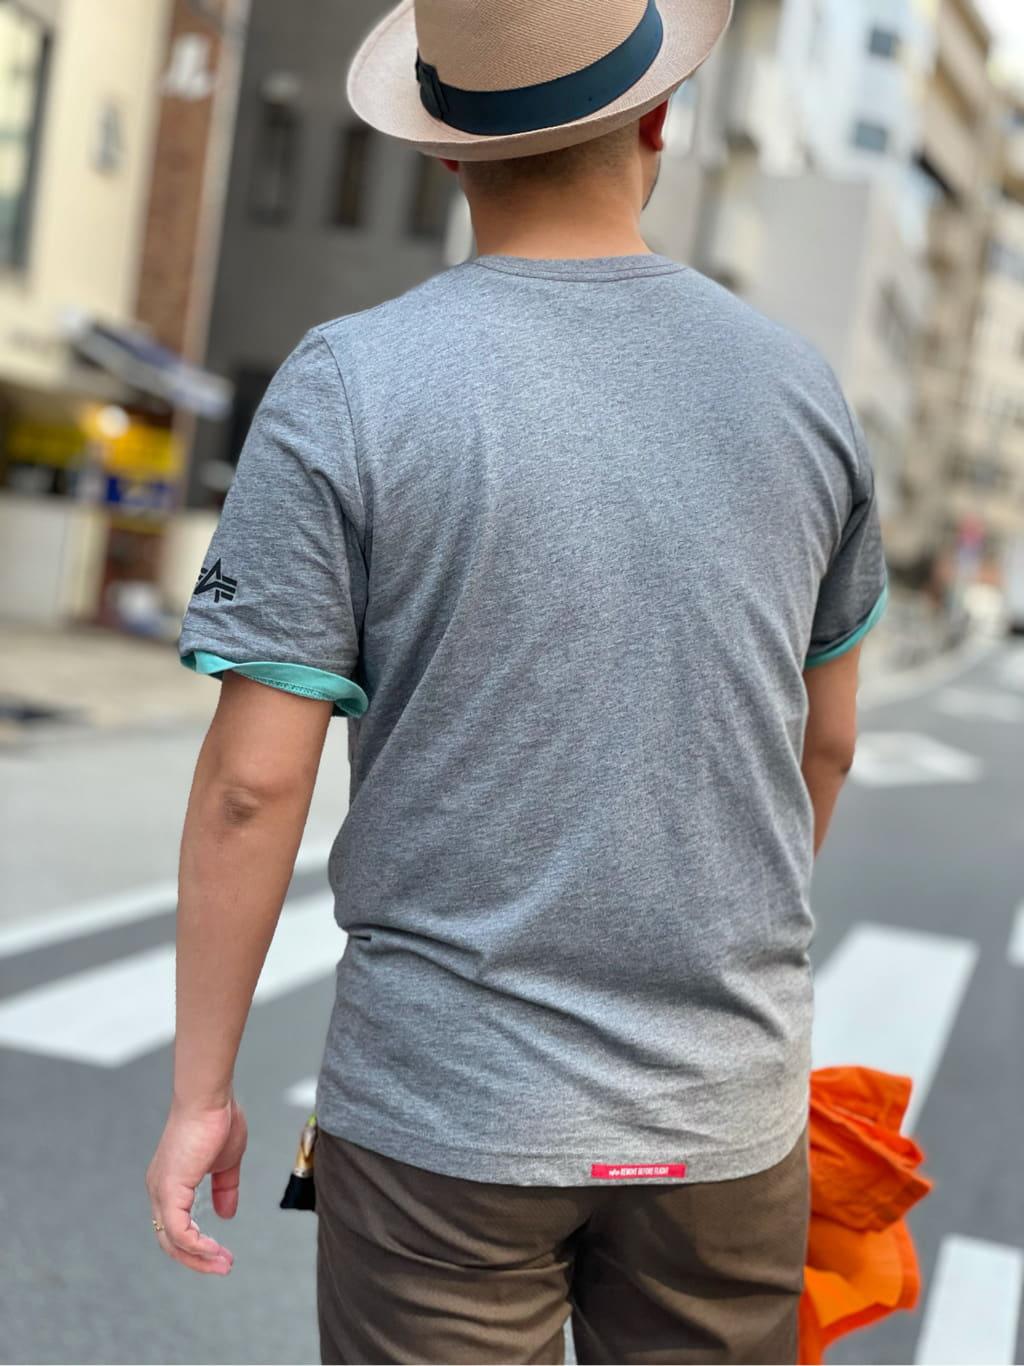 ALPHA SHOP渋谷店のKataoka.RさんのALPHAの【直営店限定】ALPHA×PLAYBOY MATCHSTICK Tシャツを使ったコーディネート